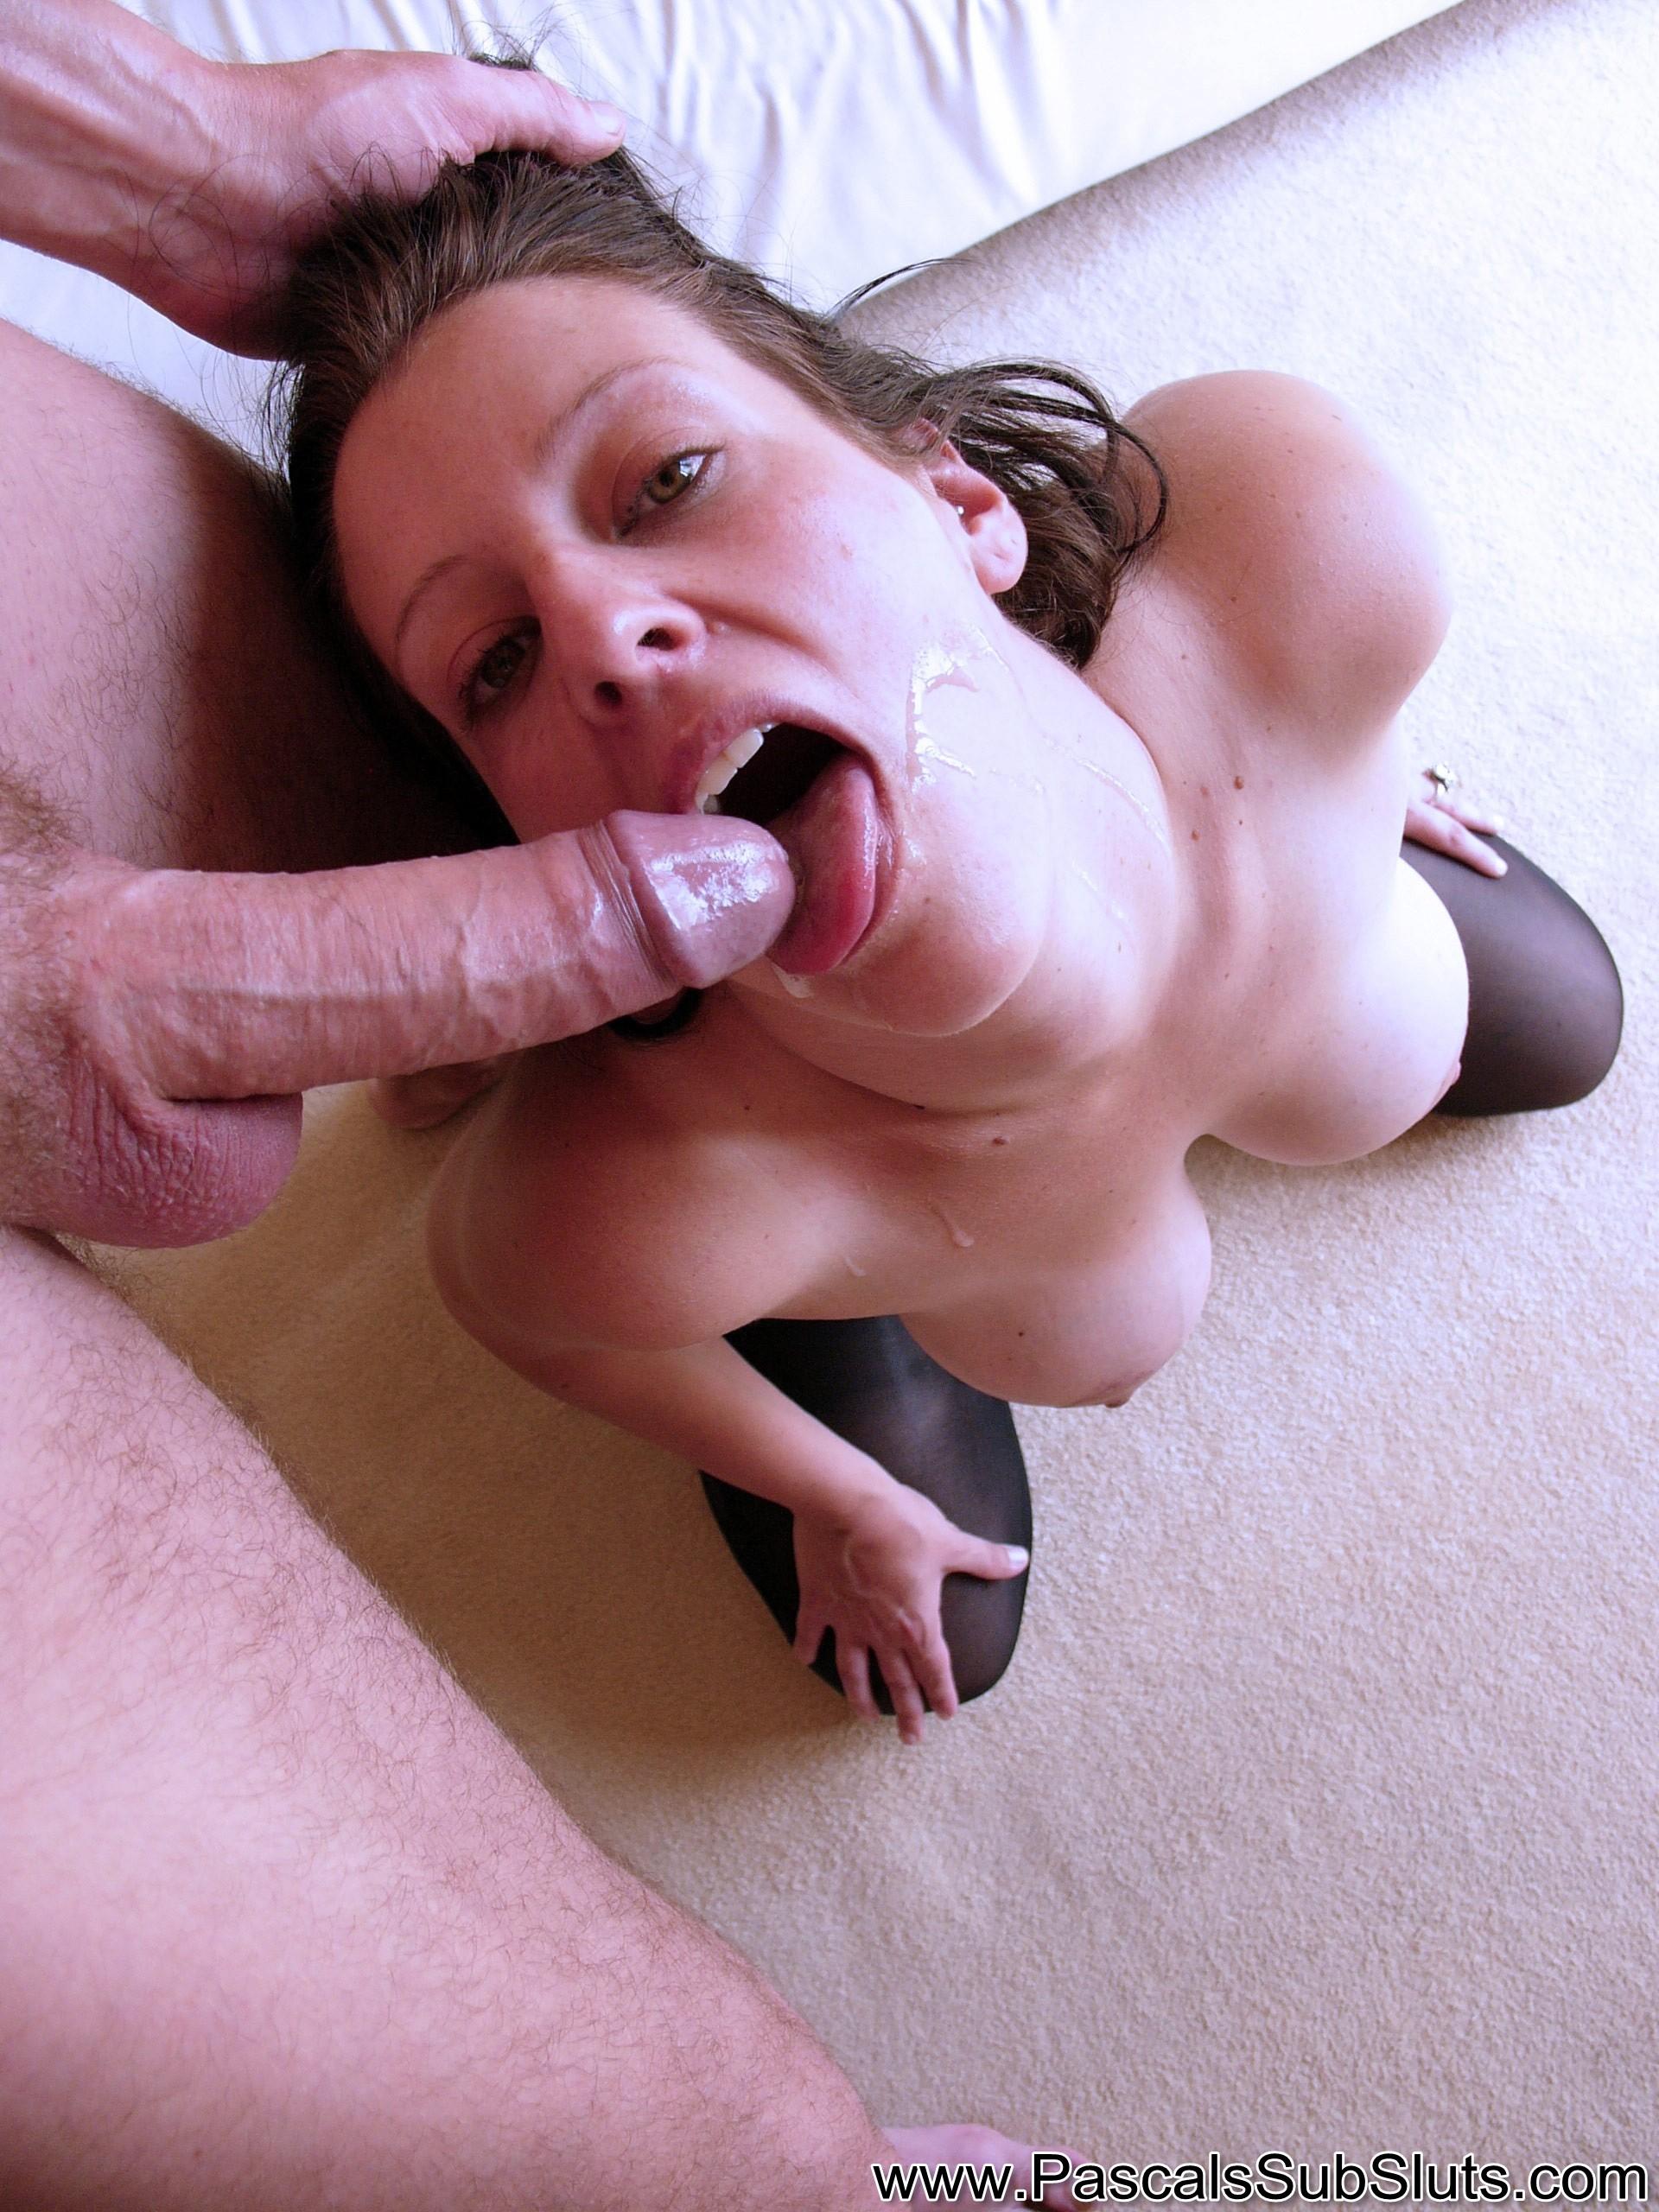 Porn Sub